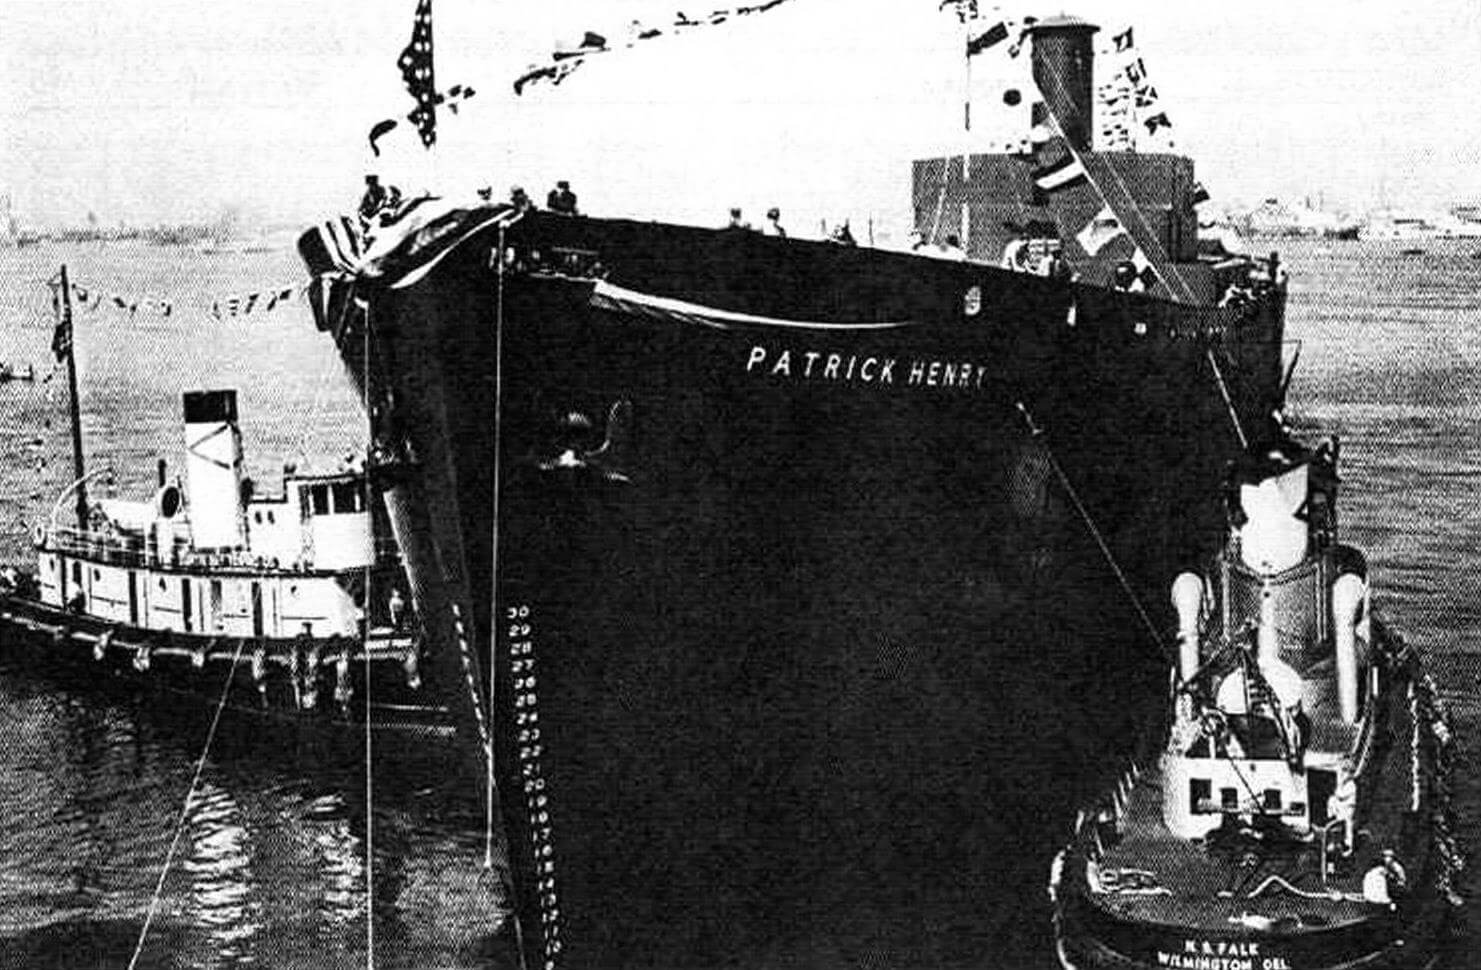 Спуск на воду первого судна типа «Либерти», парохода «Патрик Генри»